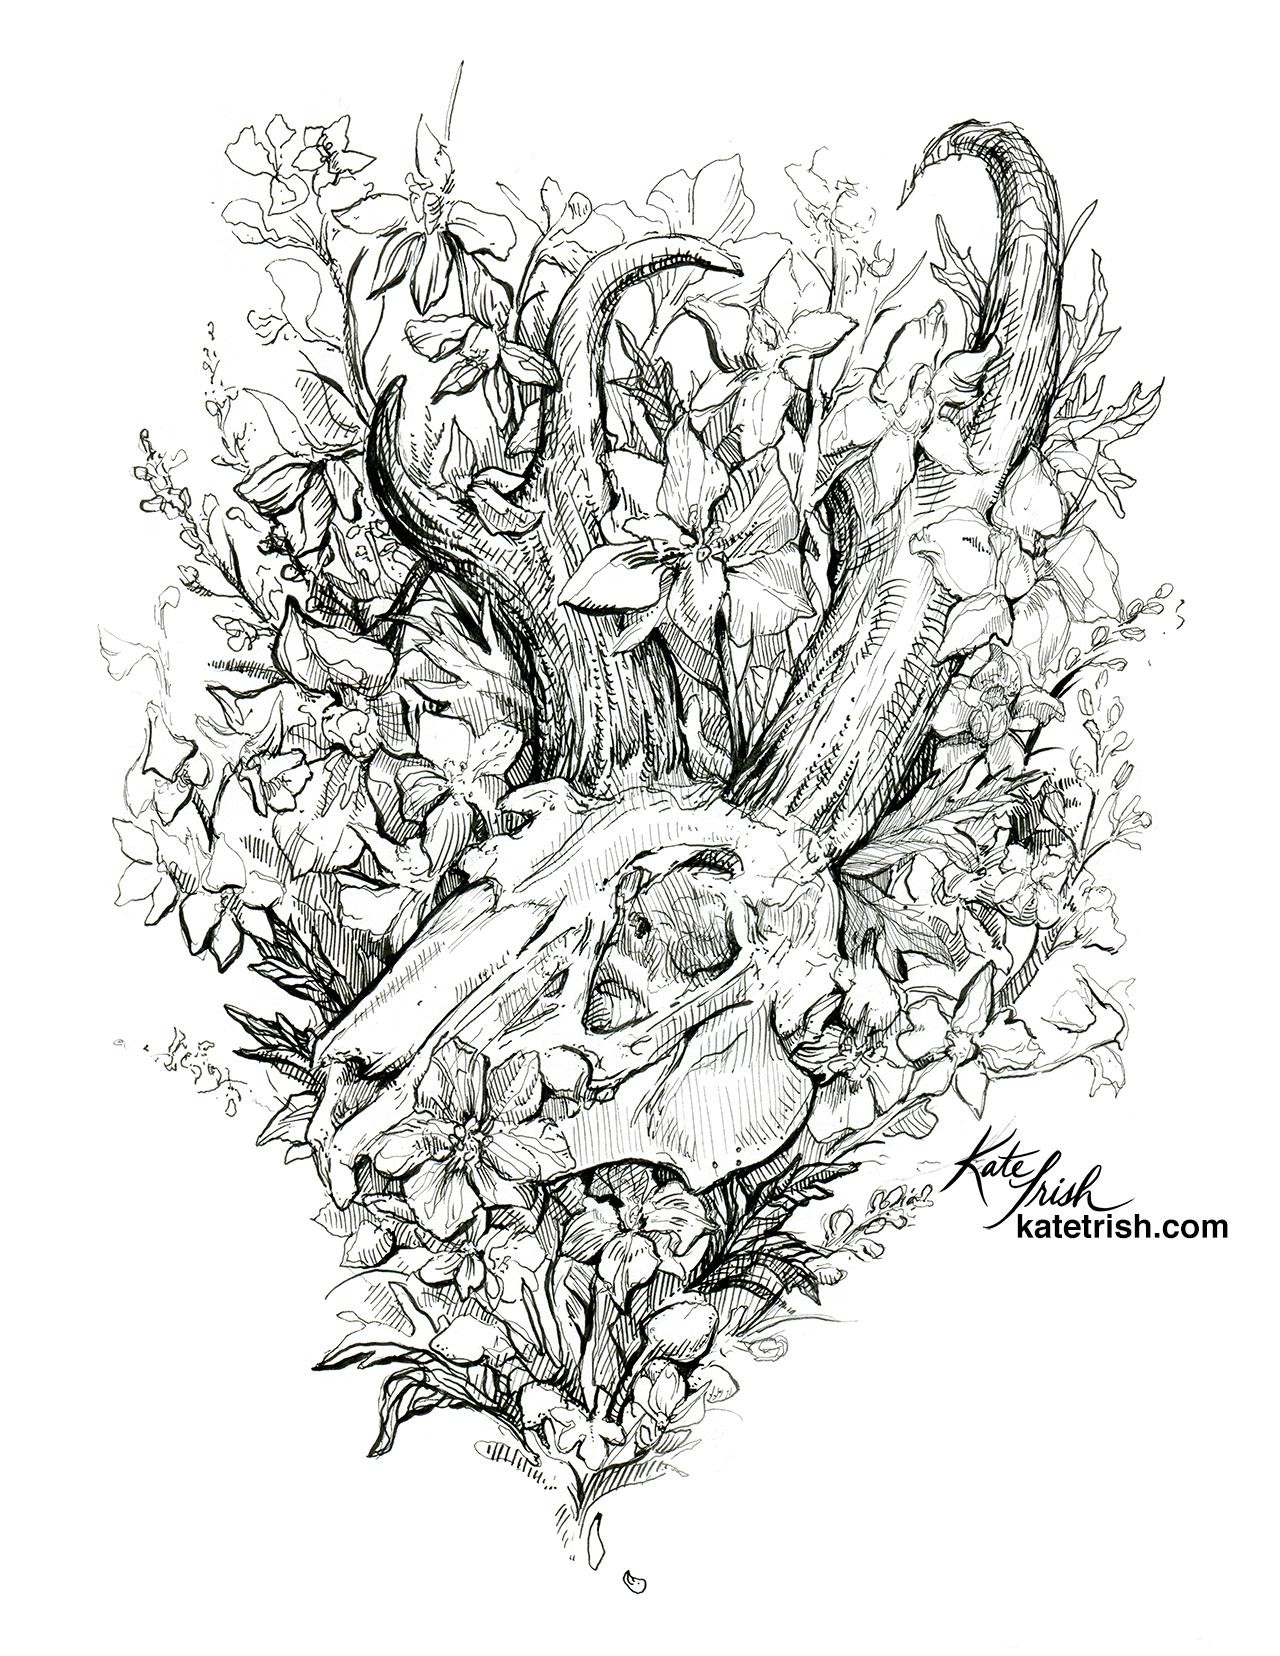 Memento Vitae I (Commission)